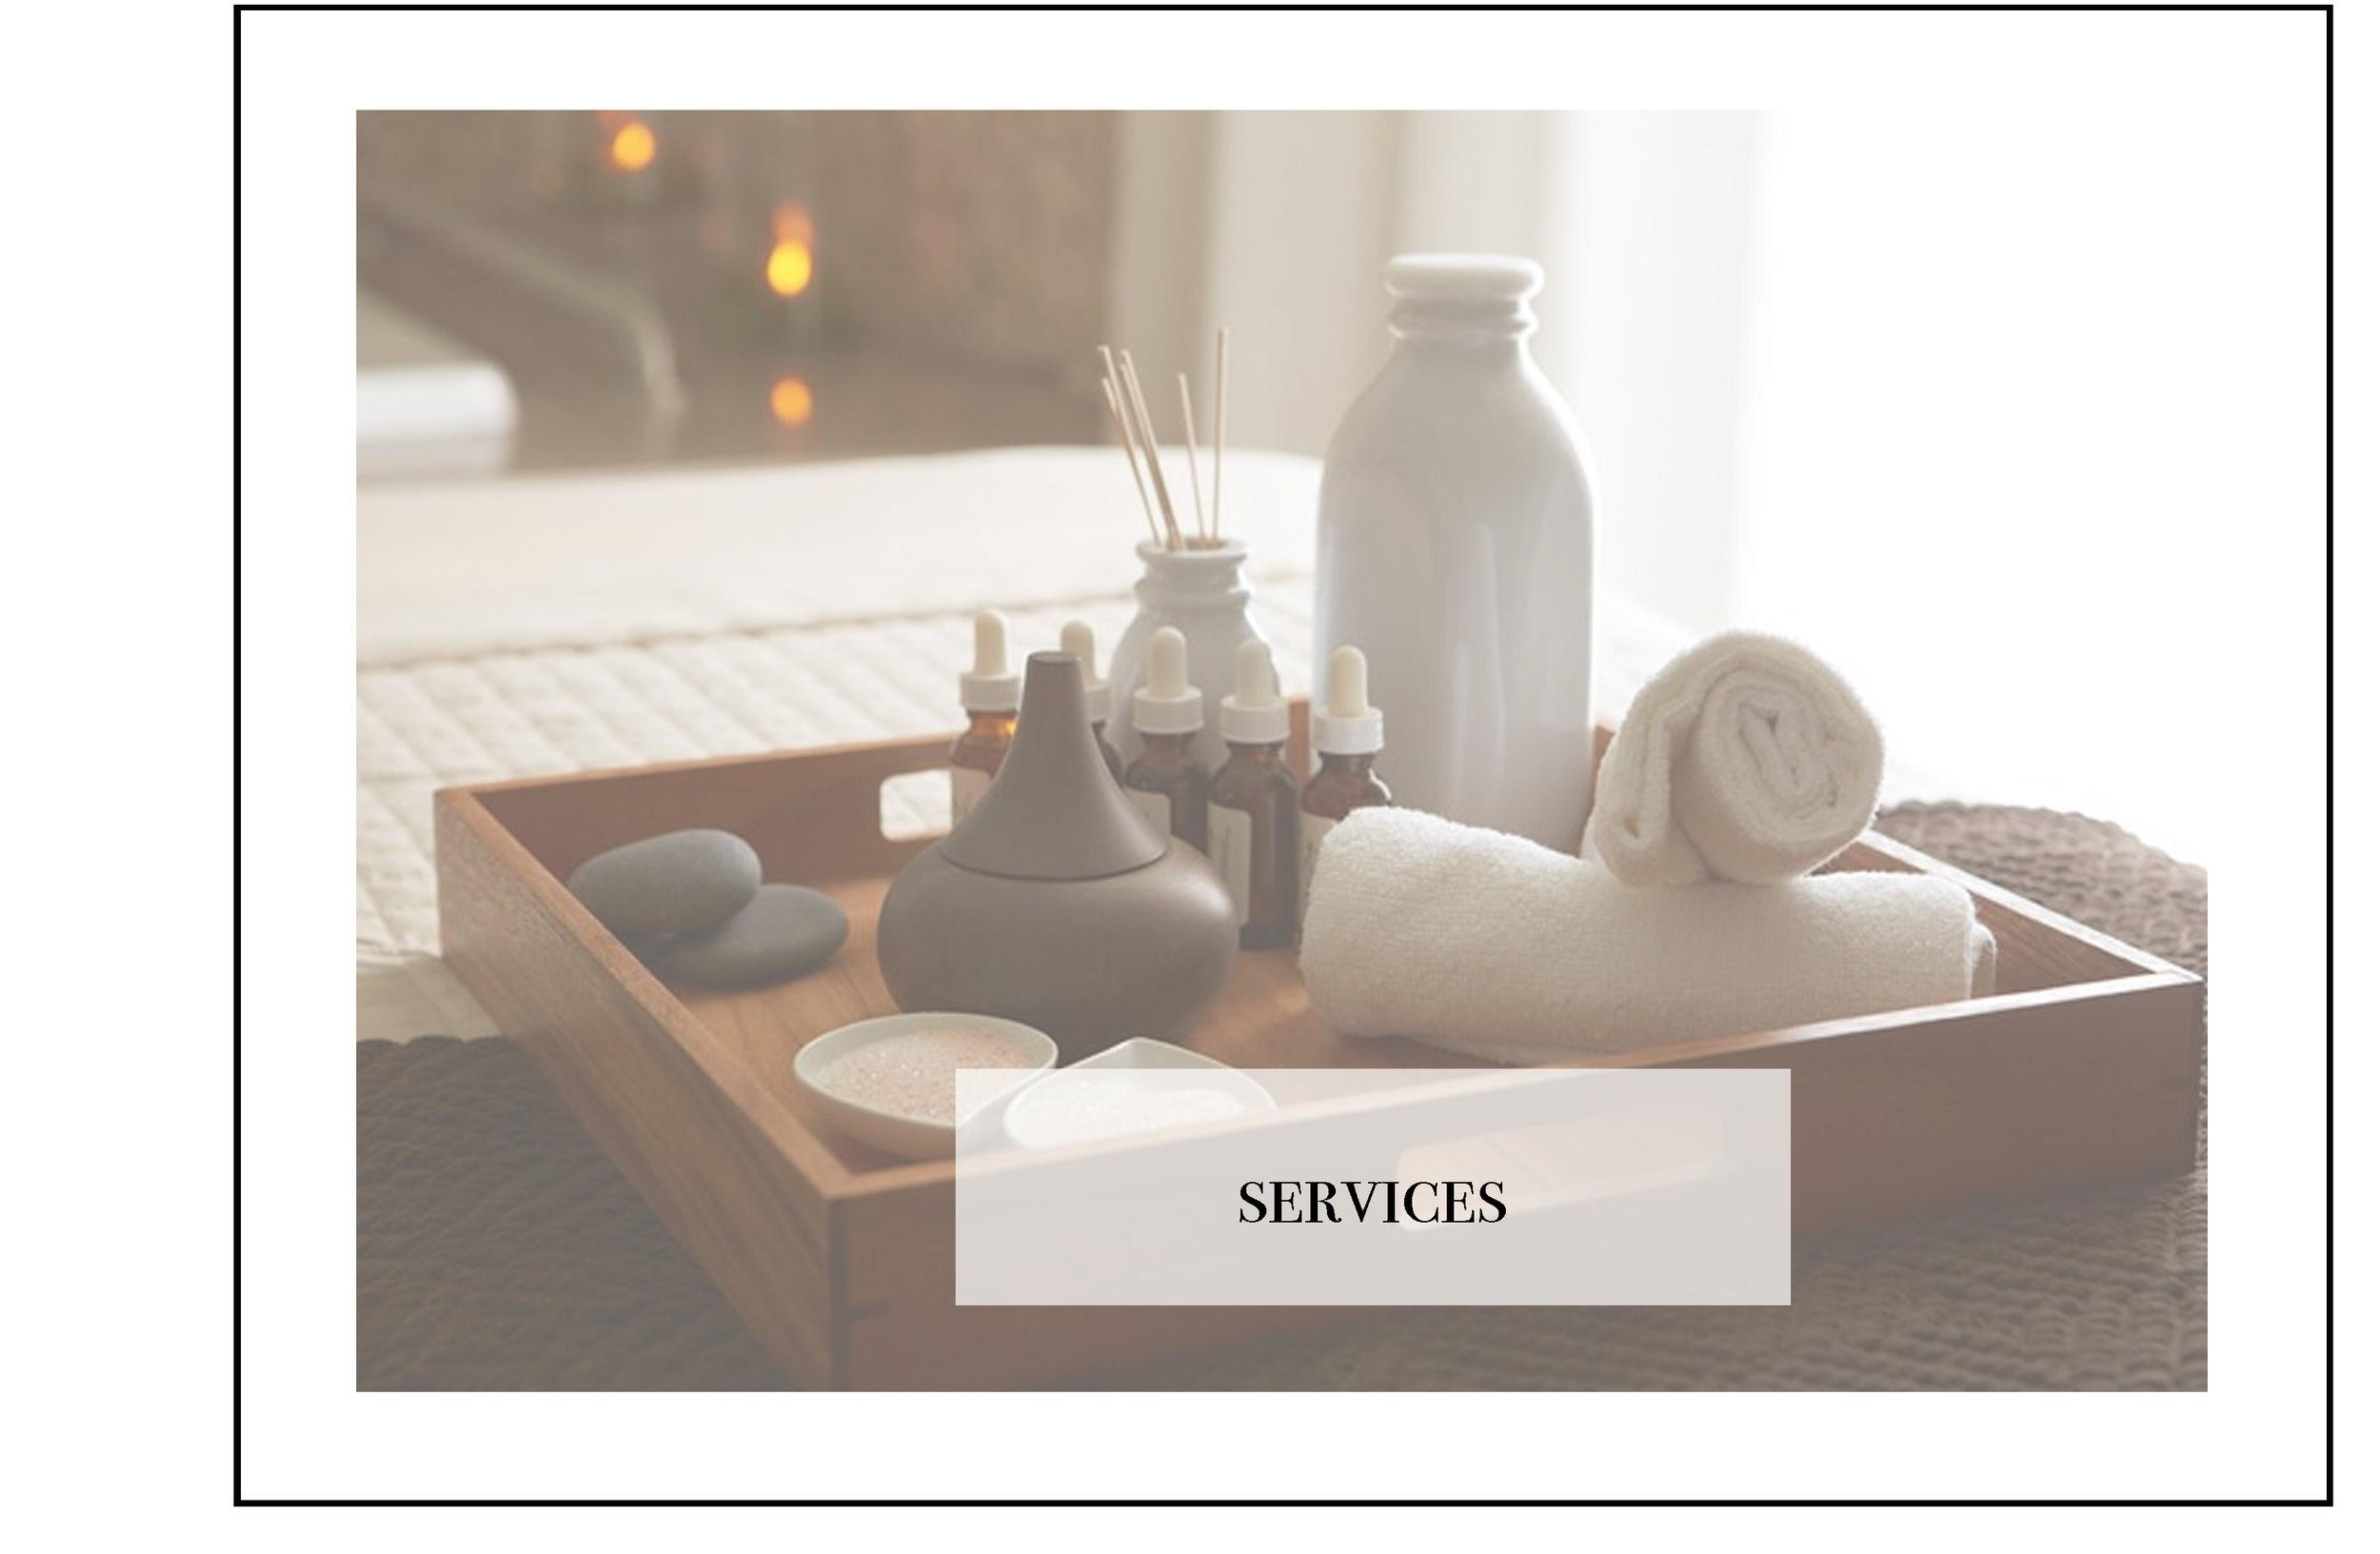 services_final1.jpg